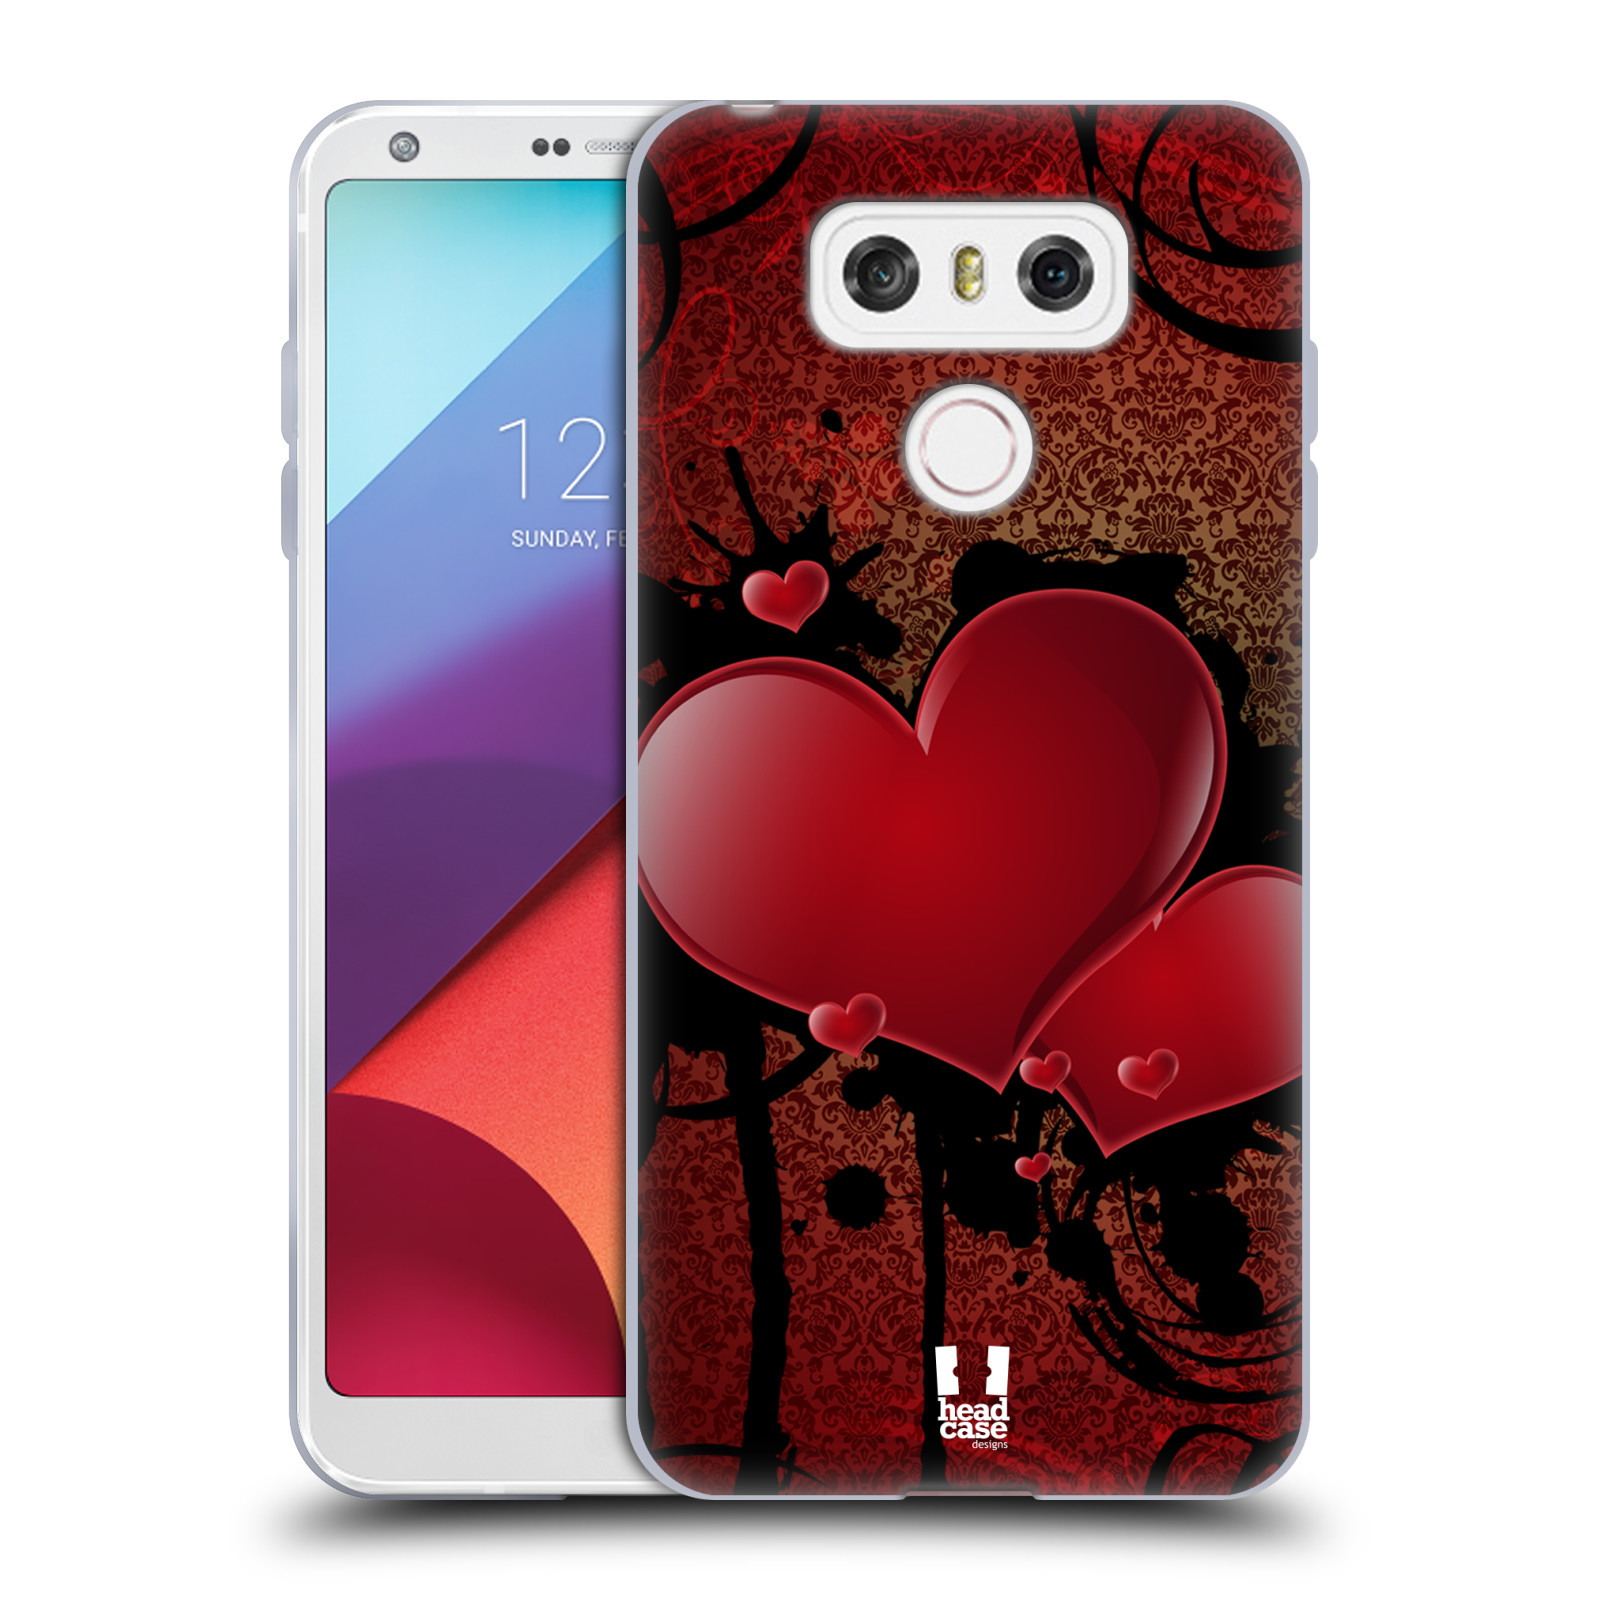 Silikonové pouzdro na mobil LG G6 - Head Case SRDÍČKA GRUNGE (Silikonový kryt či obal na mobilní telefon LG G6 H870 / LG G6 Dual SIM H870DS)